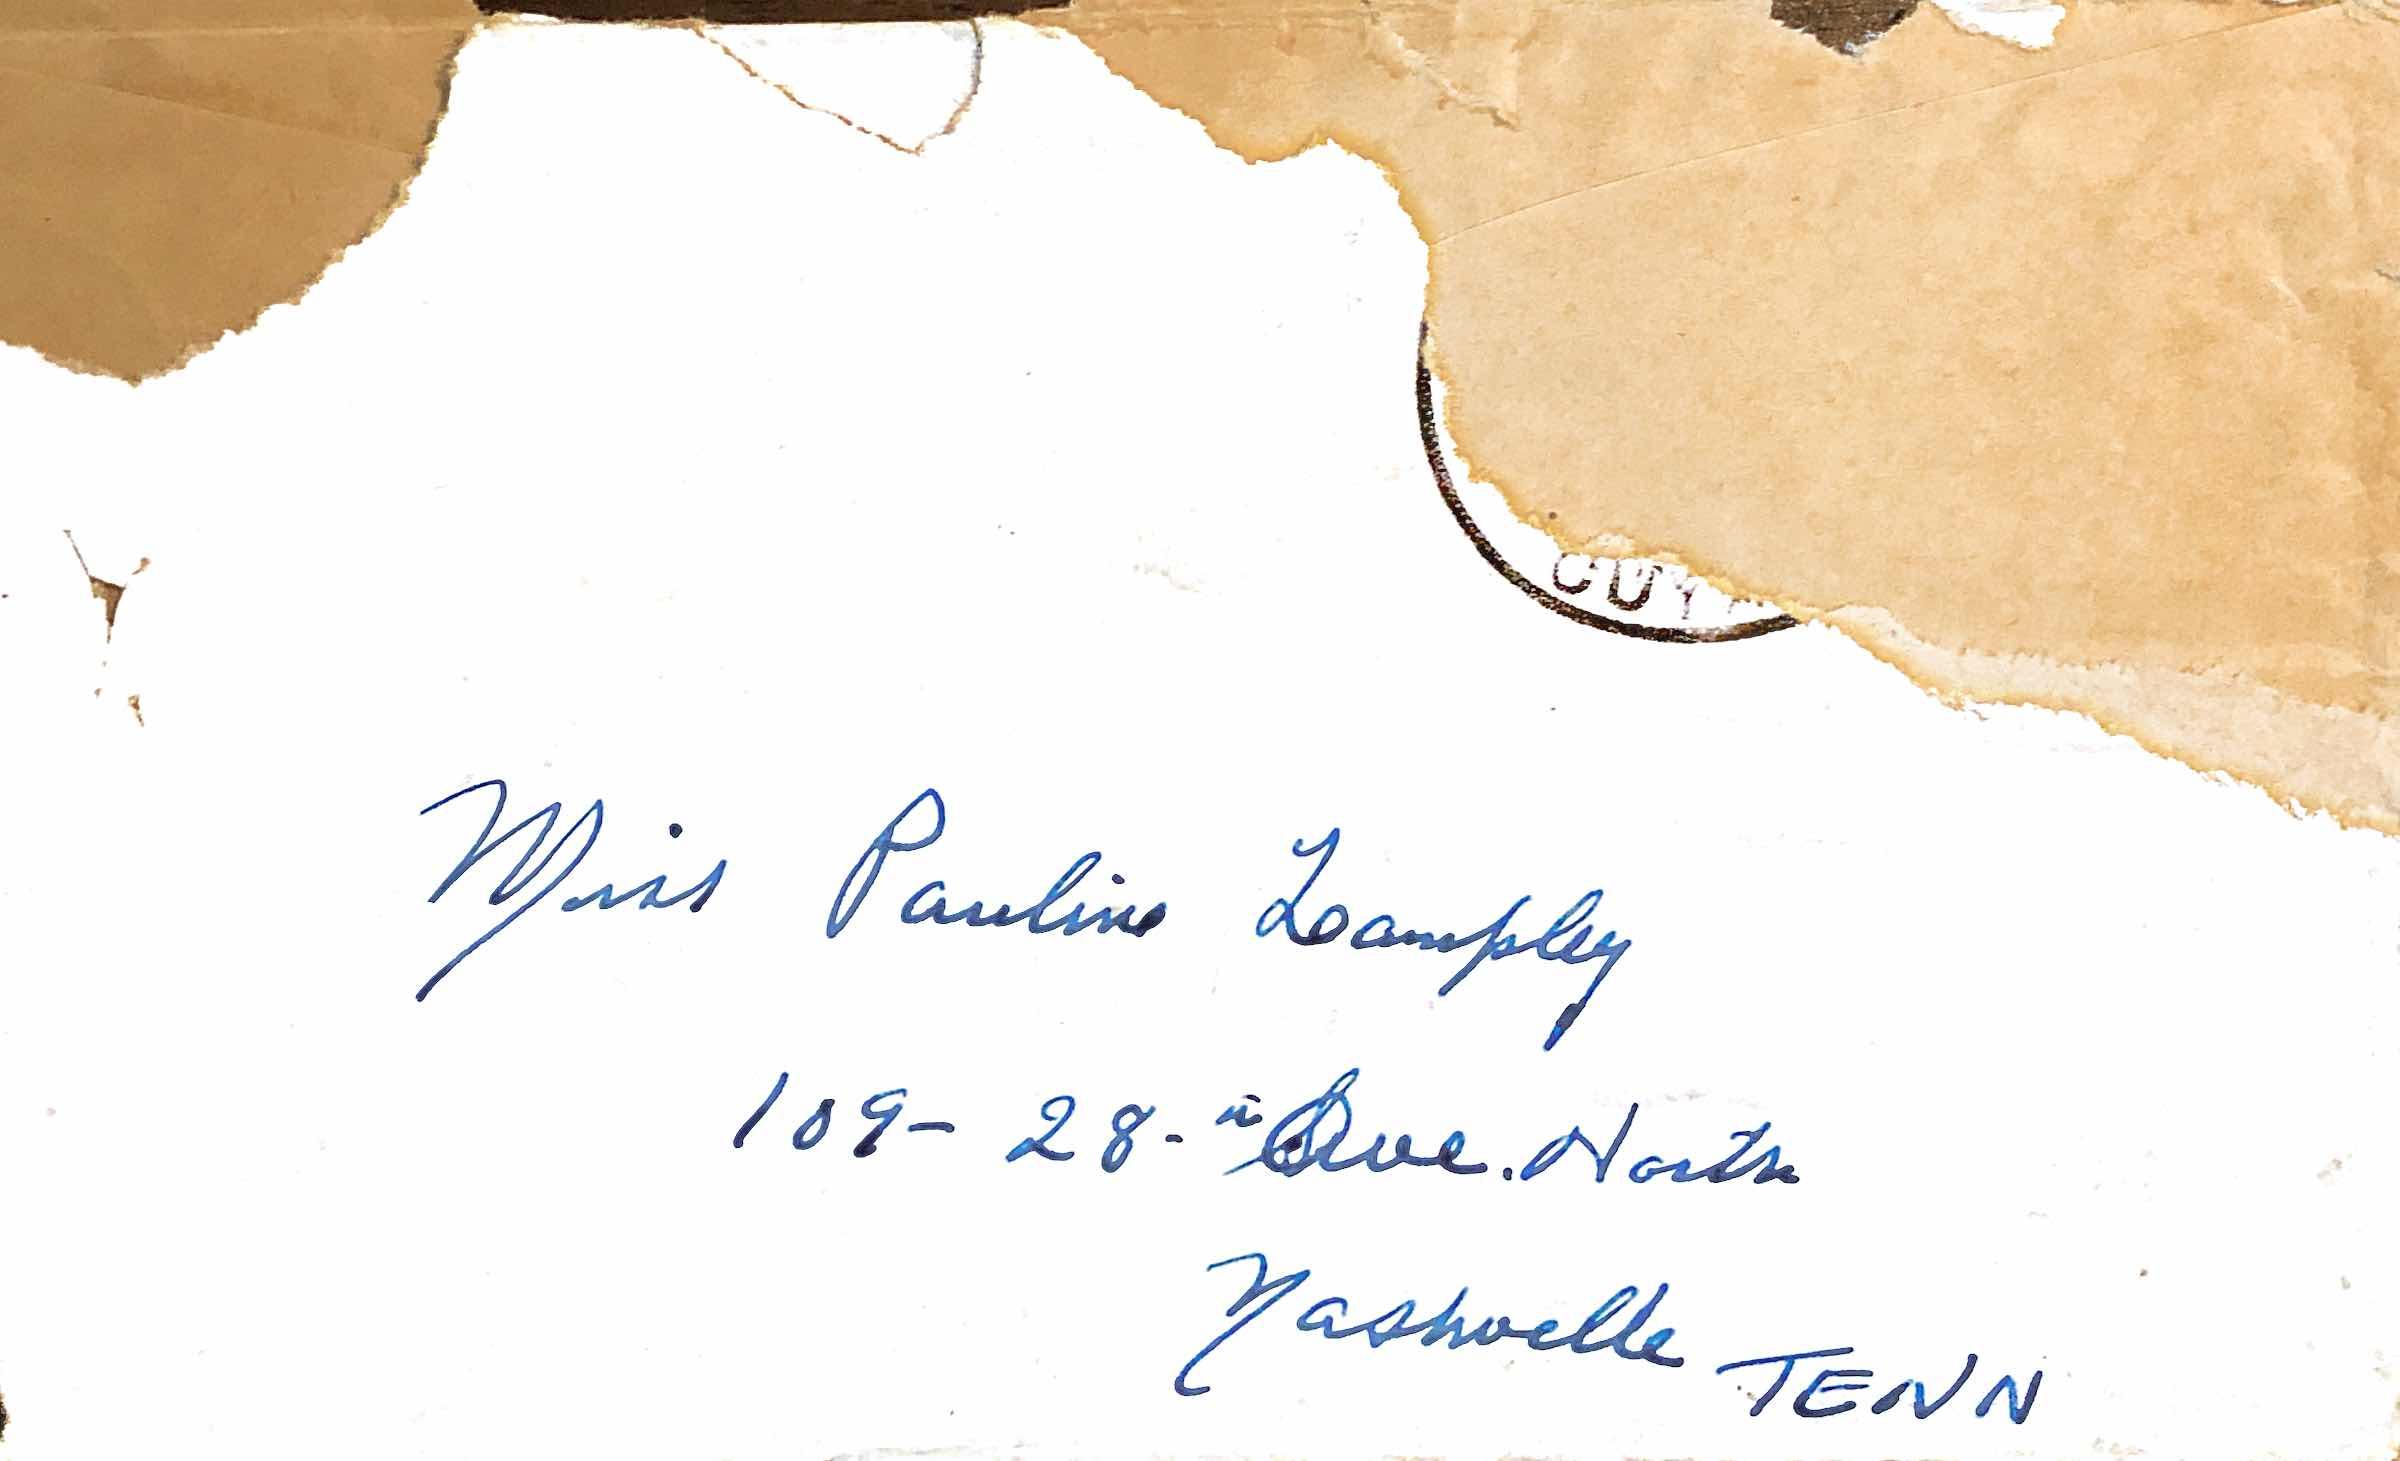 September 21, 1941 Dear Pauline